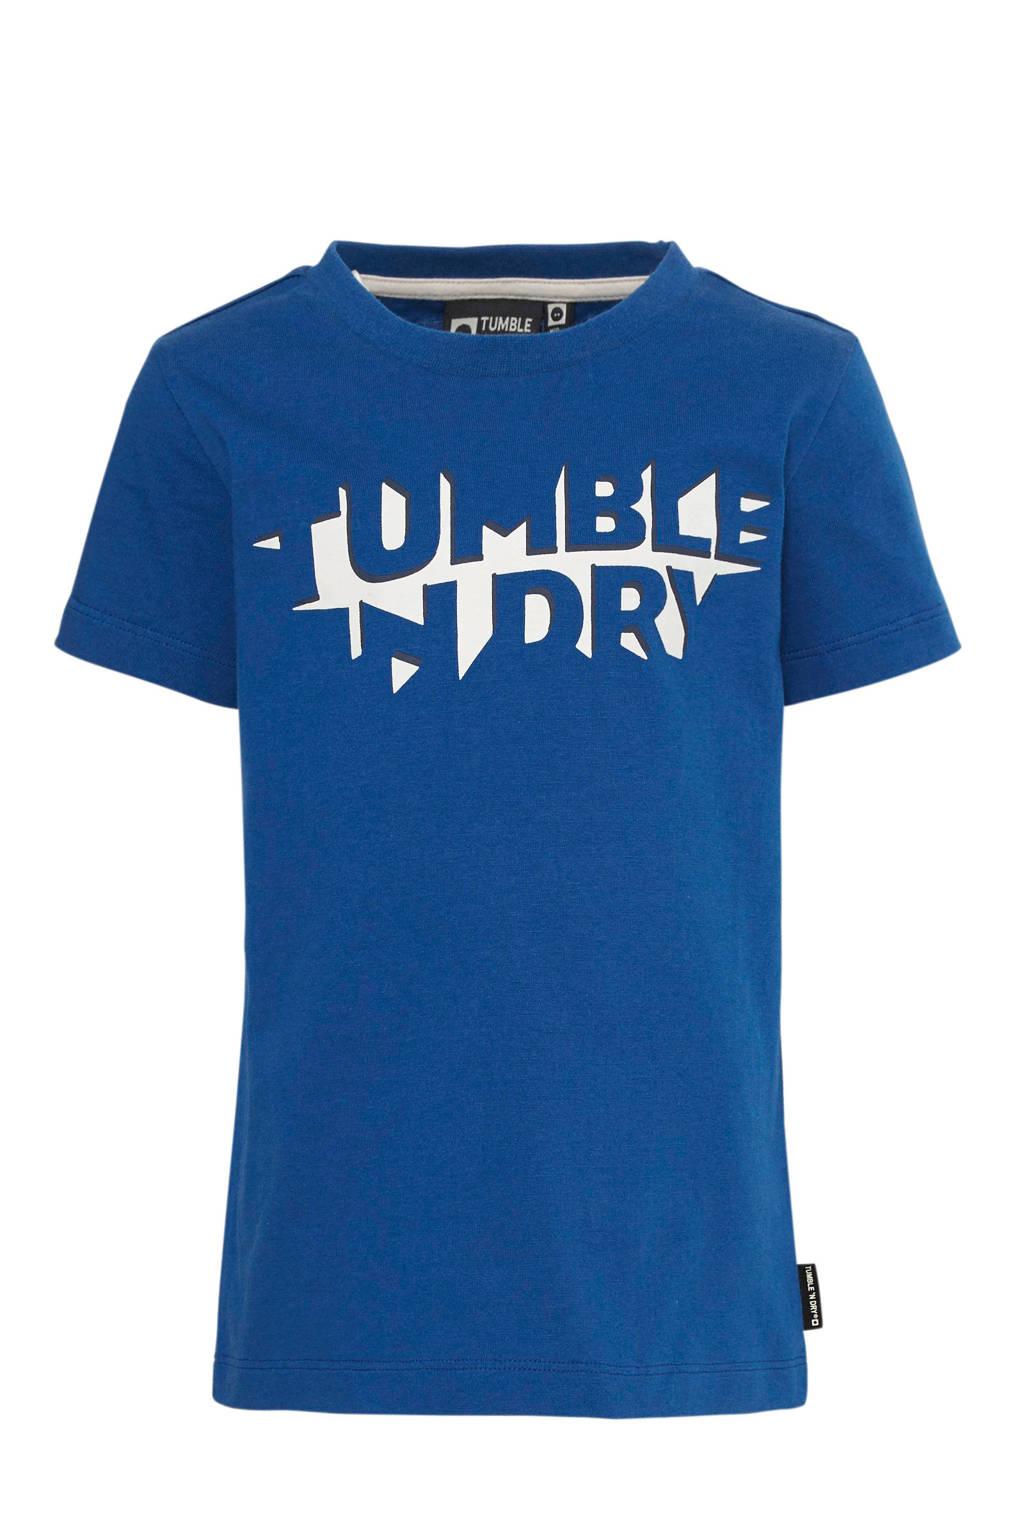 Tumble 'n Dry Mid regular fit T-shirt Gus met logo blauw/wit, Blauw/wit